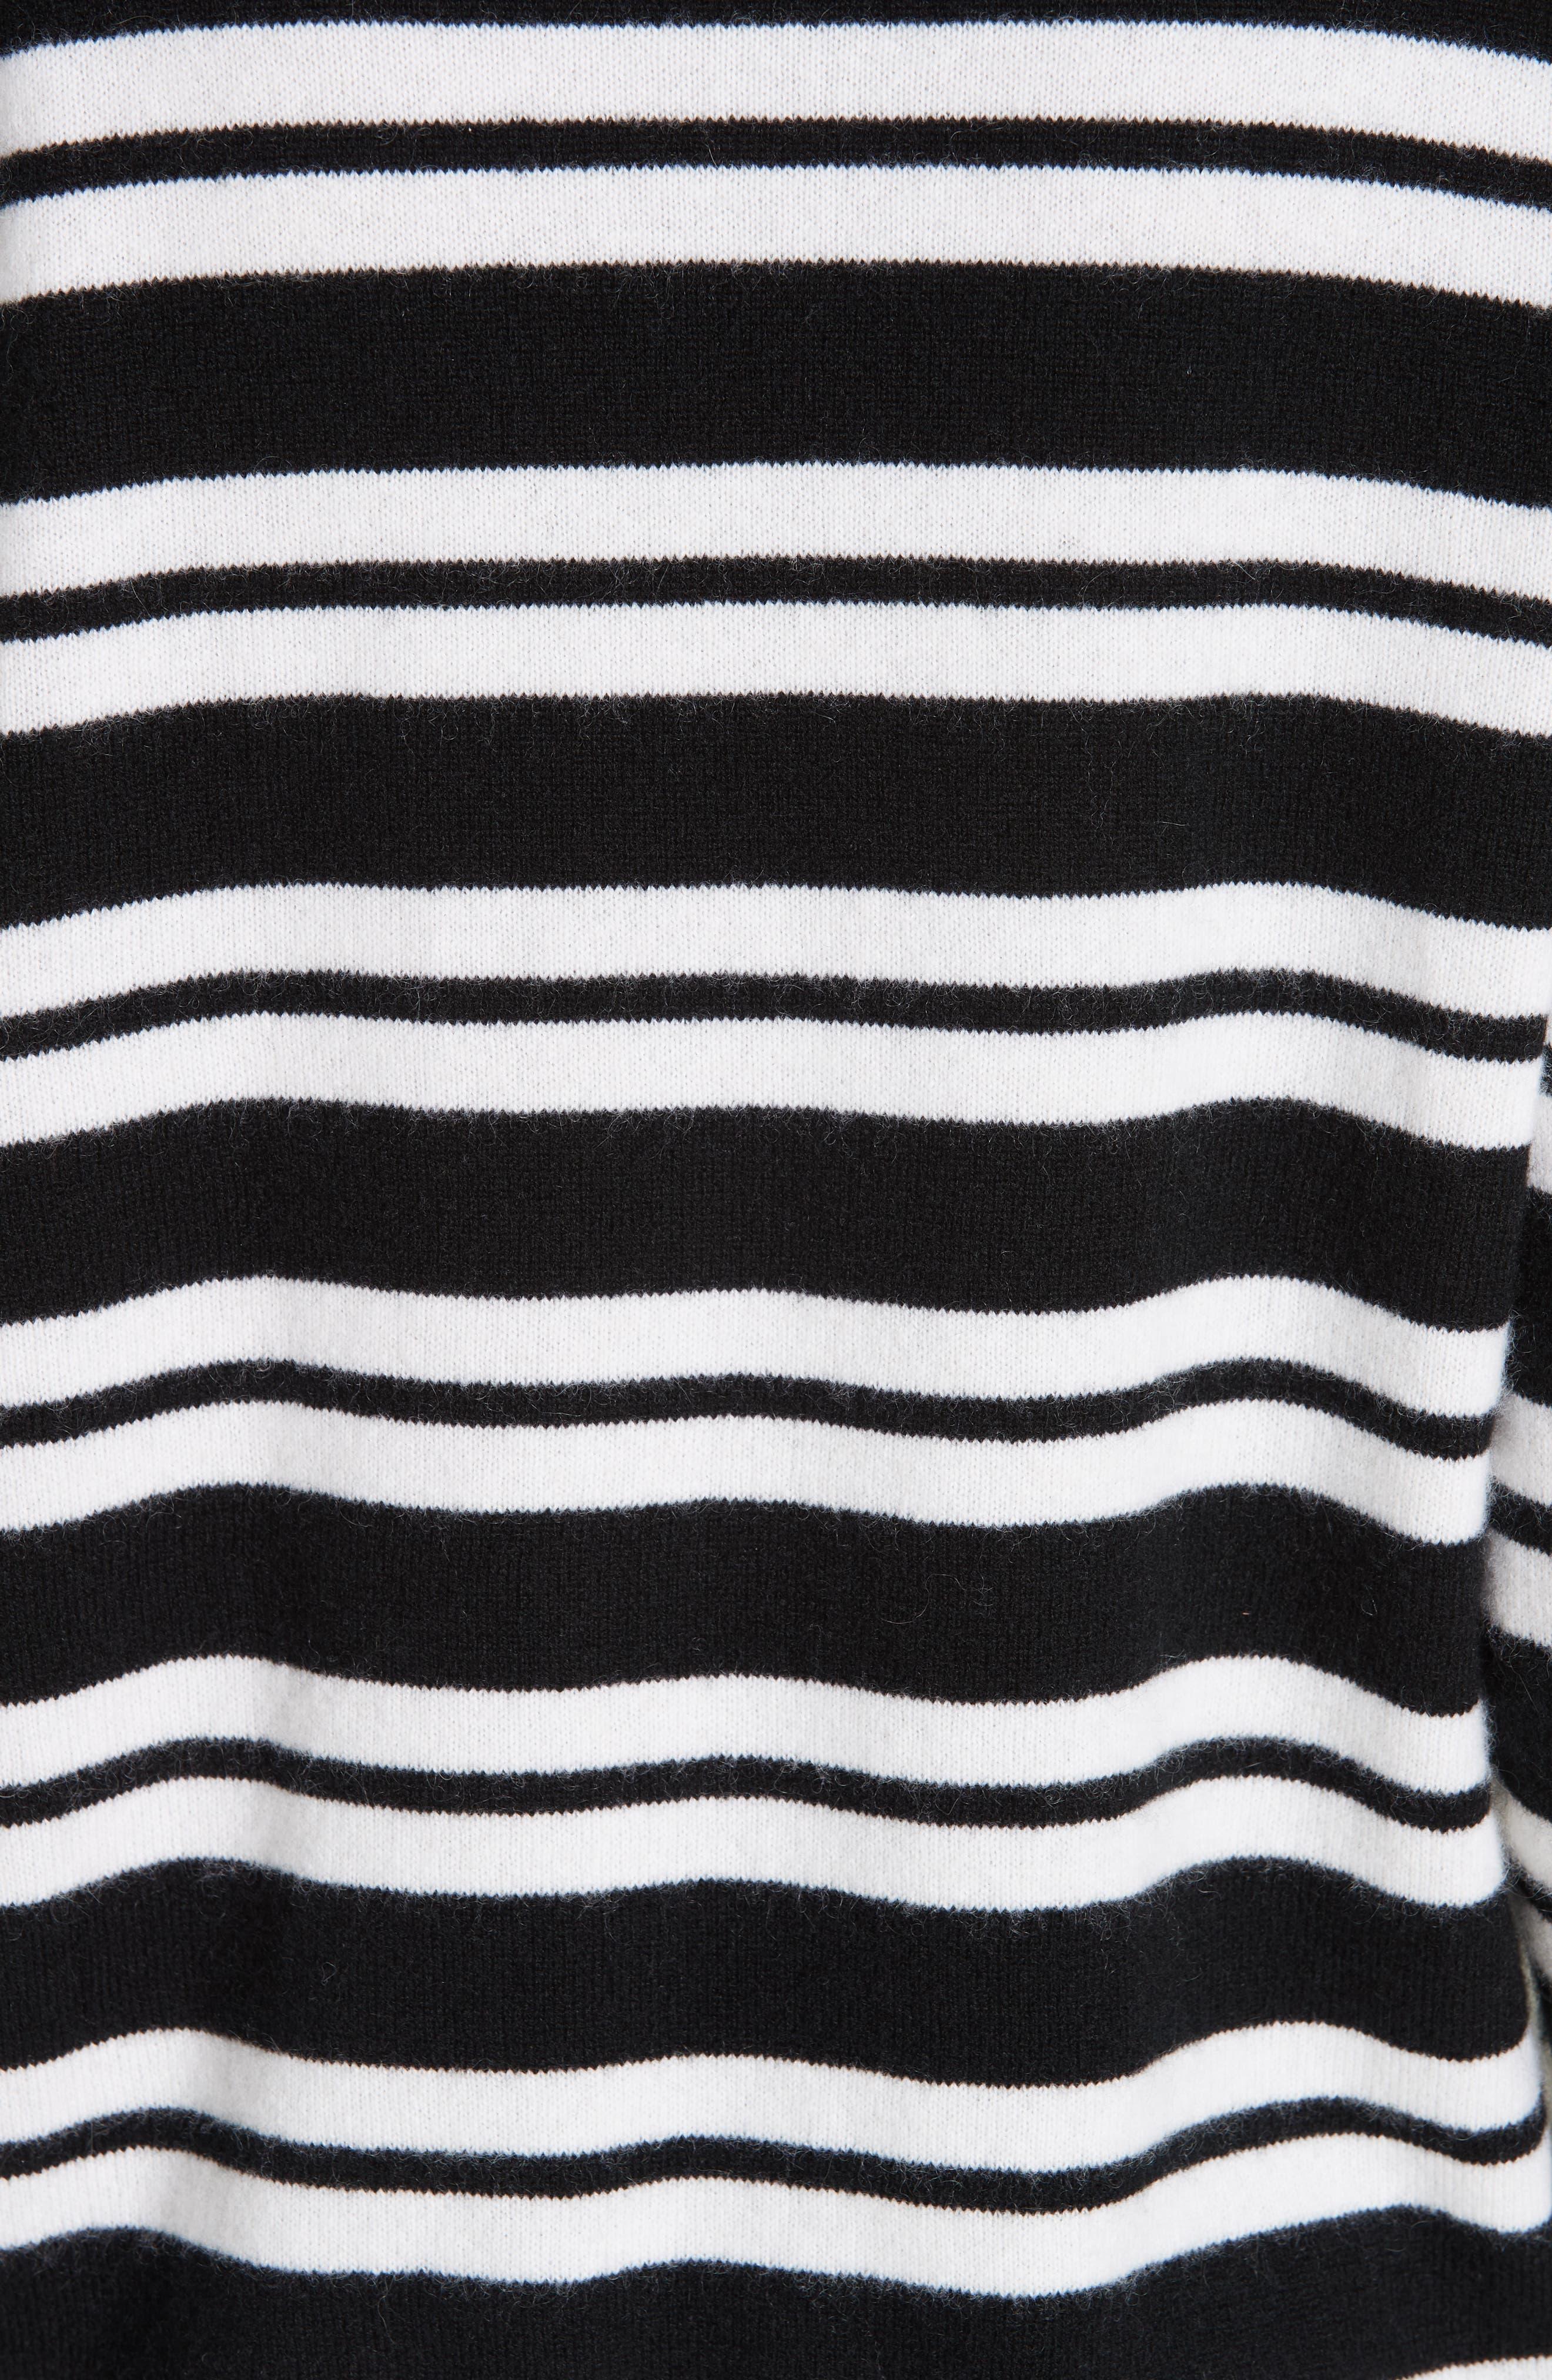 Le Ligne Tripe Stripe Cashmere Sweater,                             Alternate thumbnail 5, color,                             BLACK/ CREAM